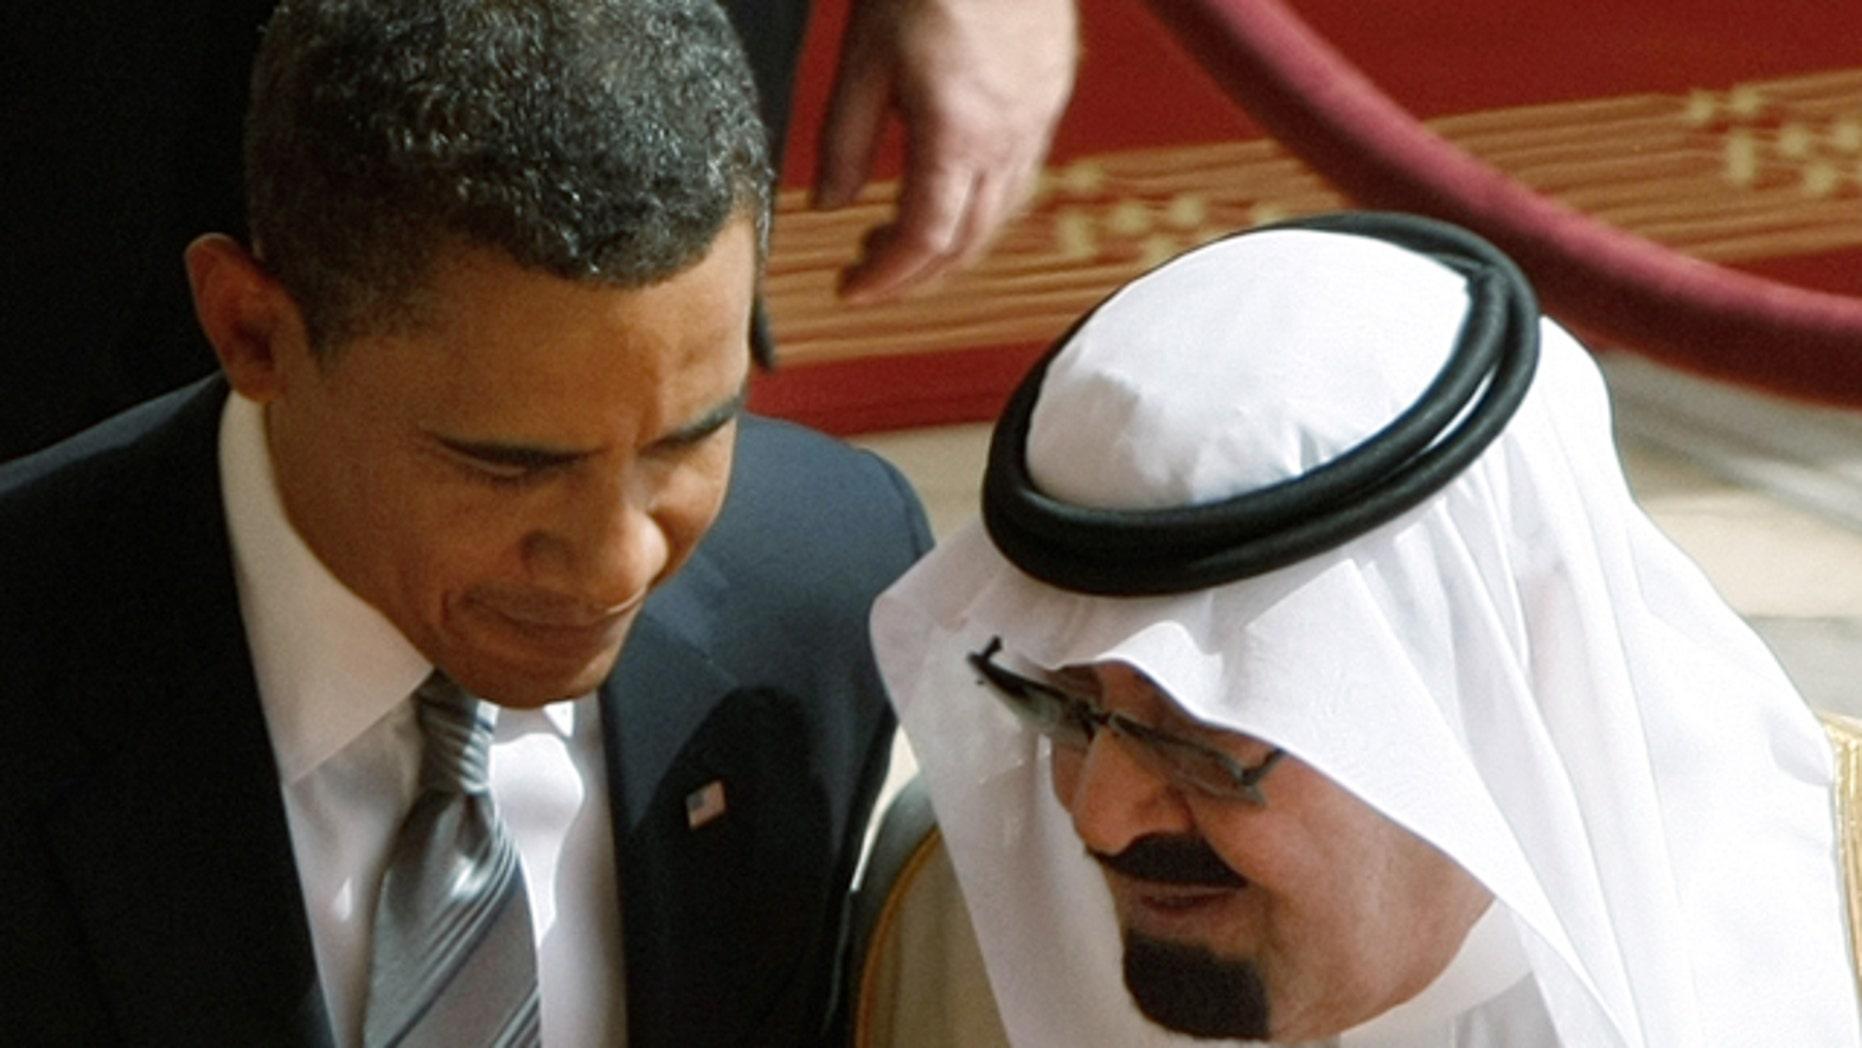 FILE - In this Wednesday, June 3, 2009 file photo, King Abdullah of Saudi Arabia, right, speaks with U.S. President Barack Obama, during arrival ceremonies at the Royal Terminal of King Khalid International Airport in Riyadh, Saudi Arabia. (AP Photo/Hassan Ammar)